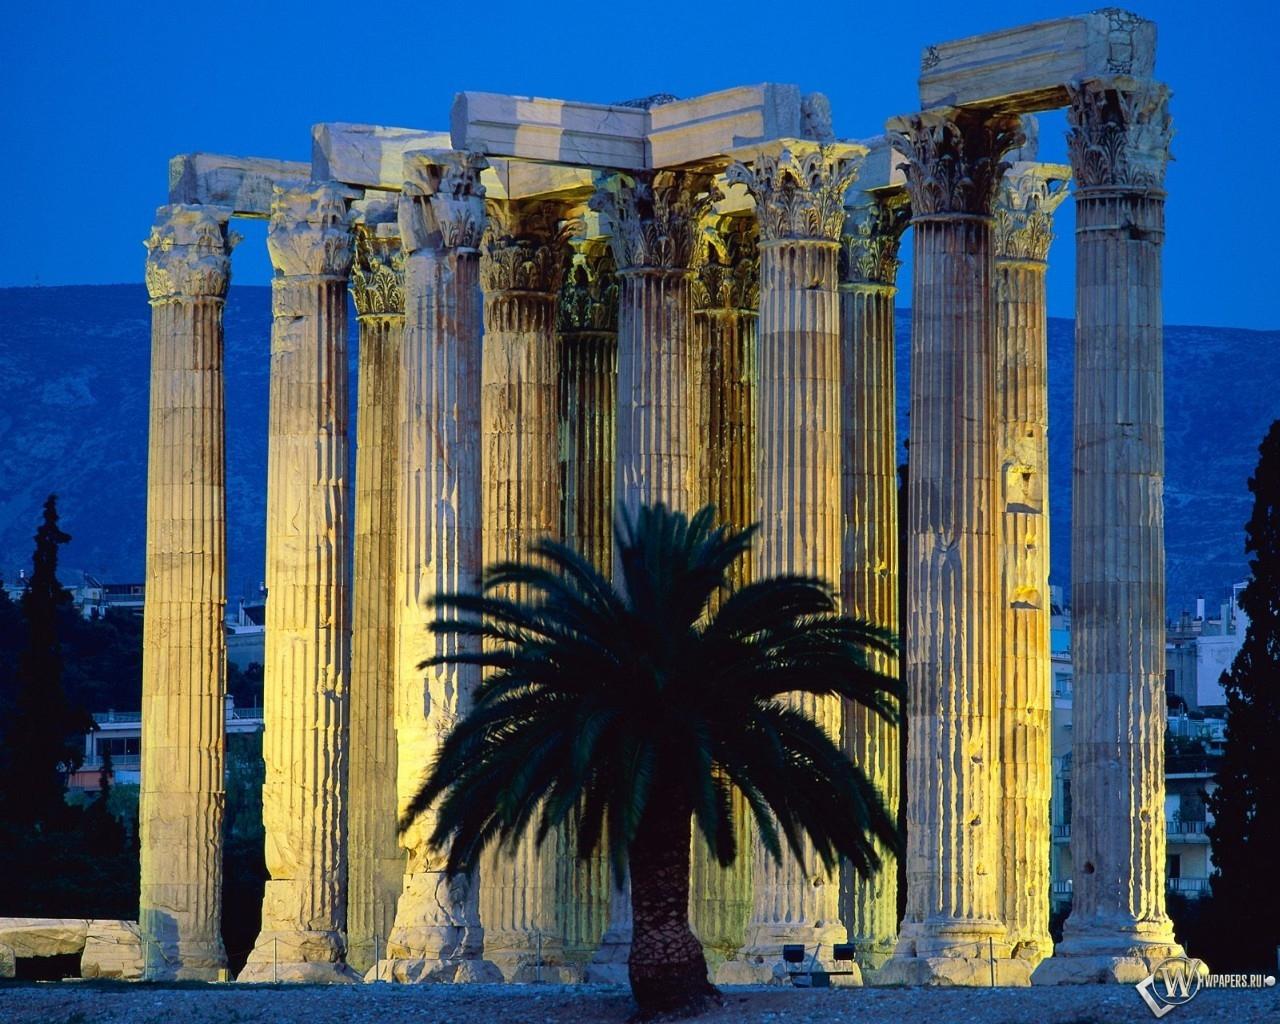 Temple Of Olympian Zeus Athens Greece 1280x1024